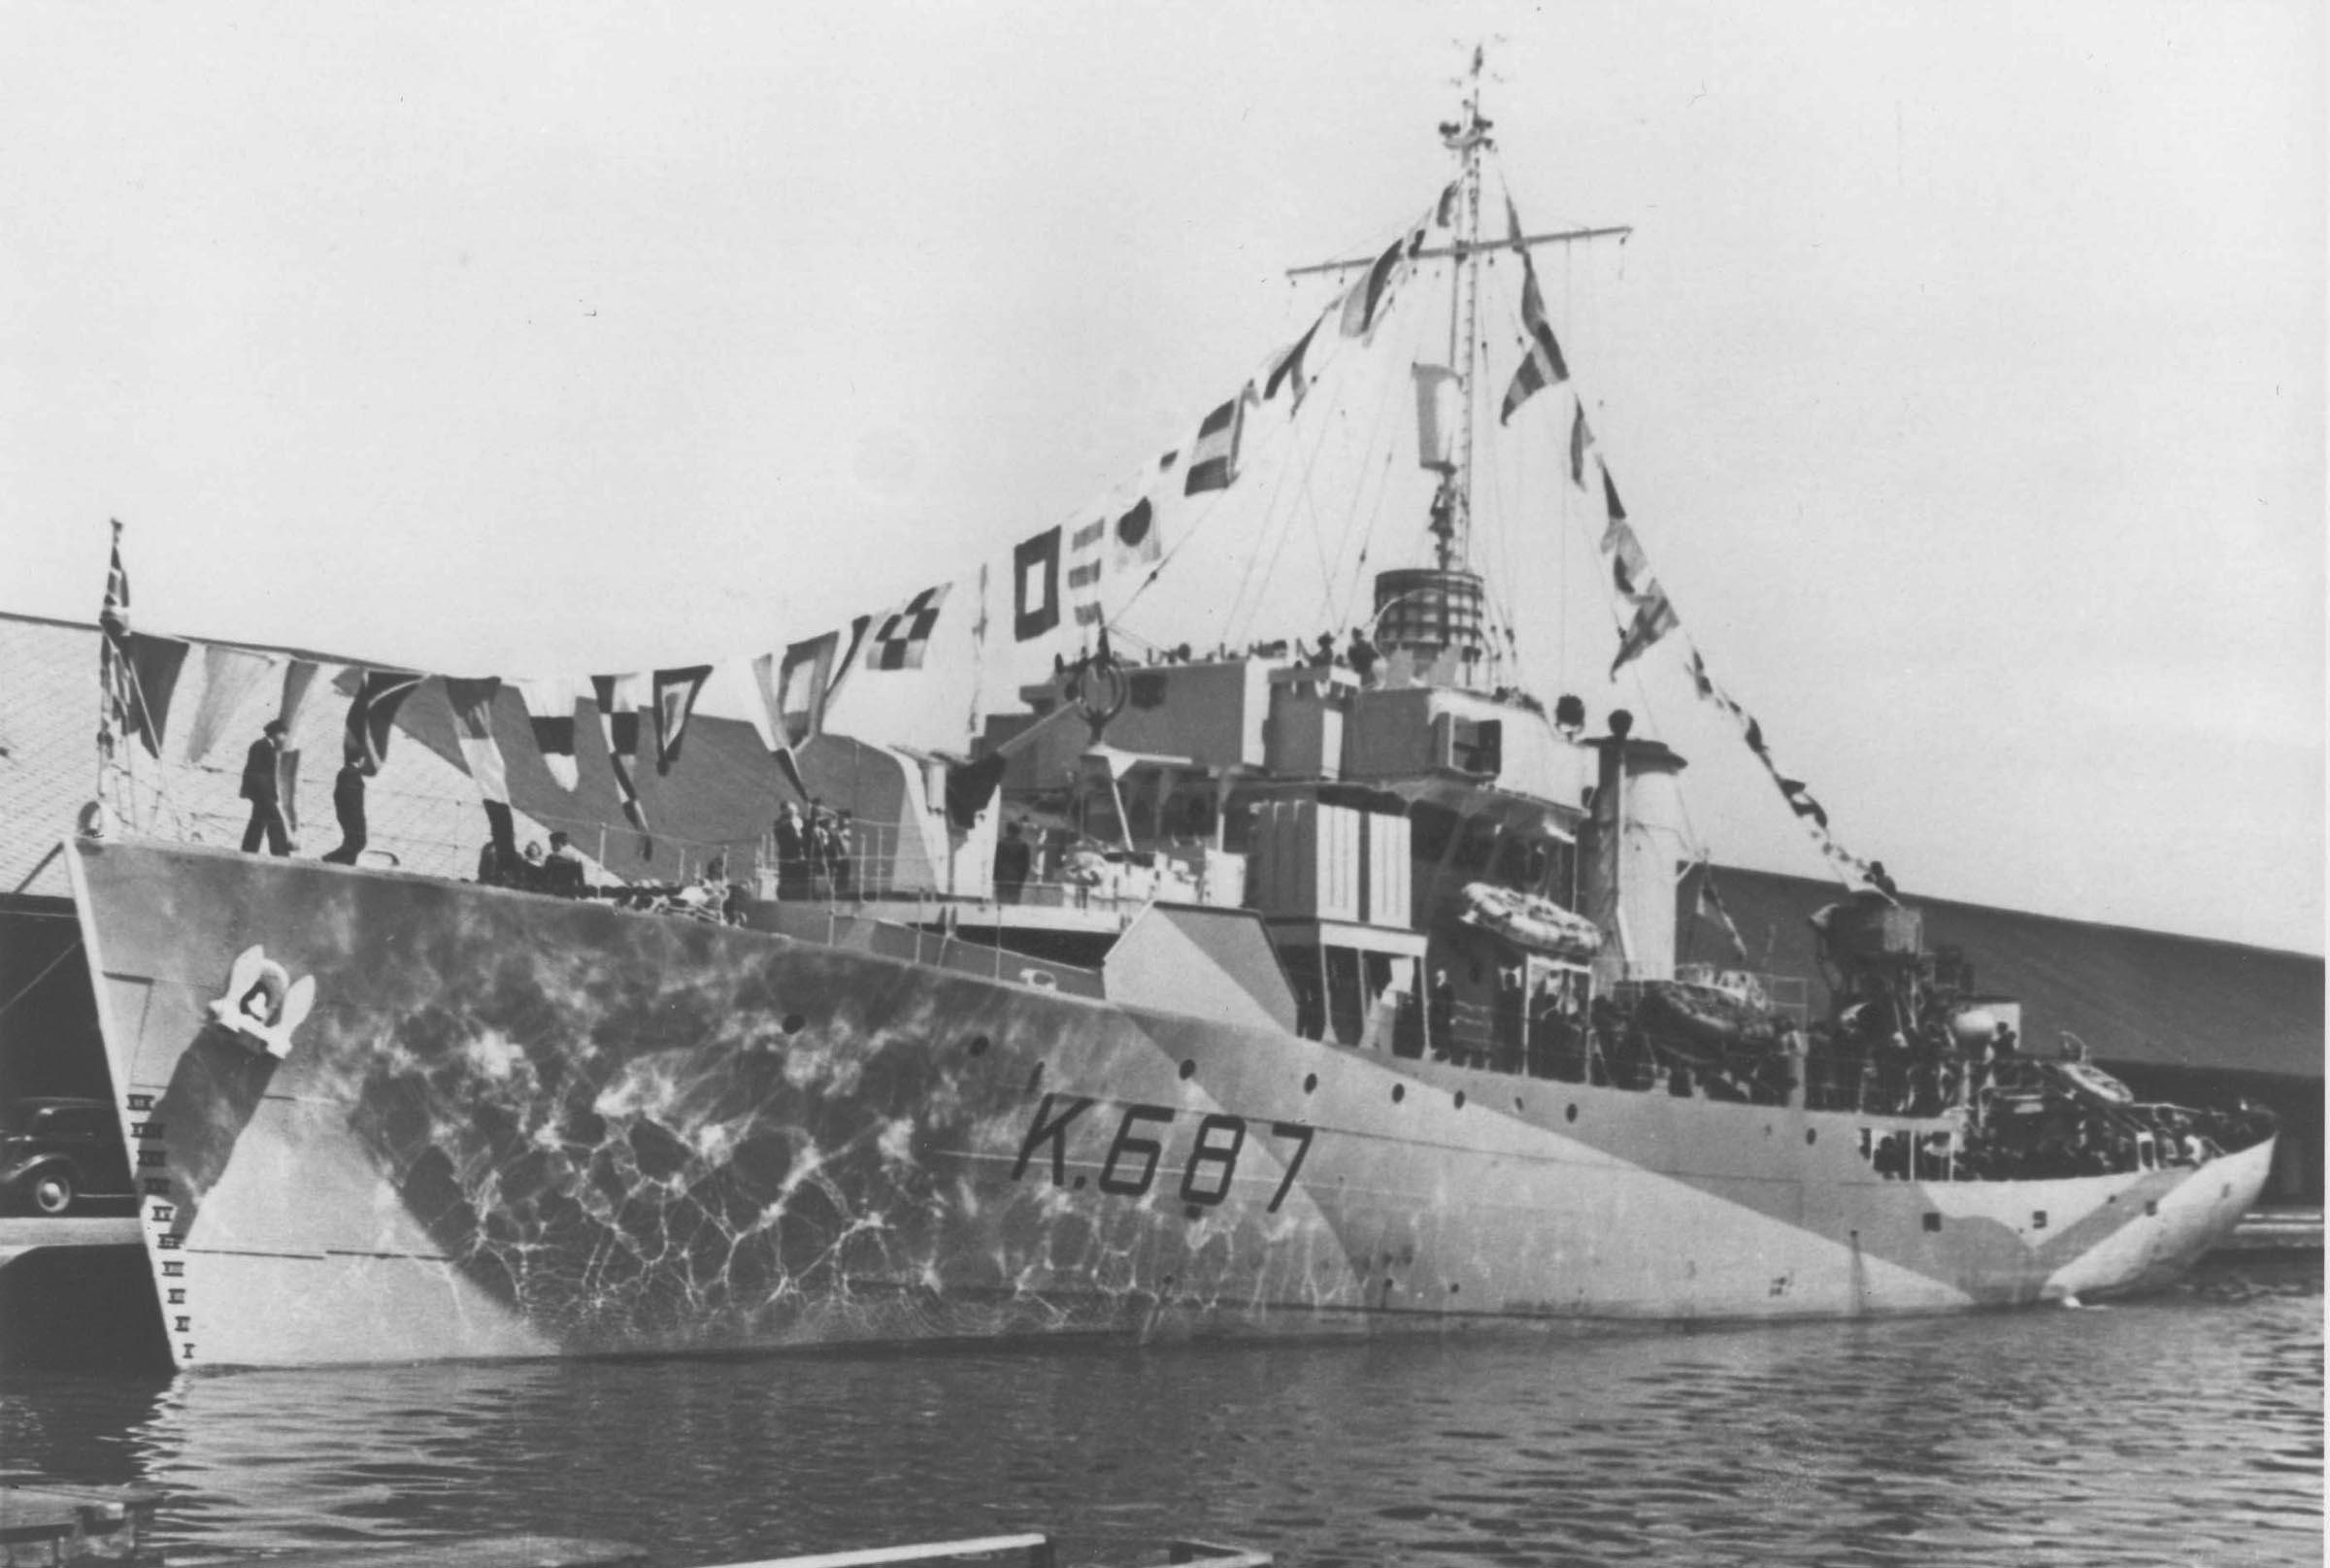 HMCS GUELPH